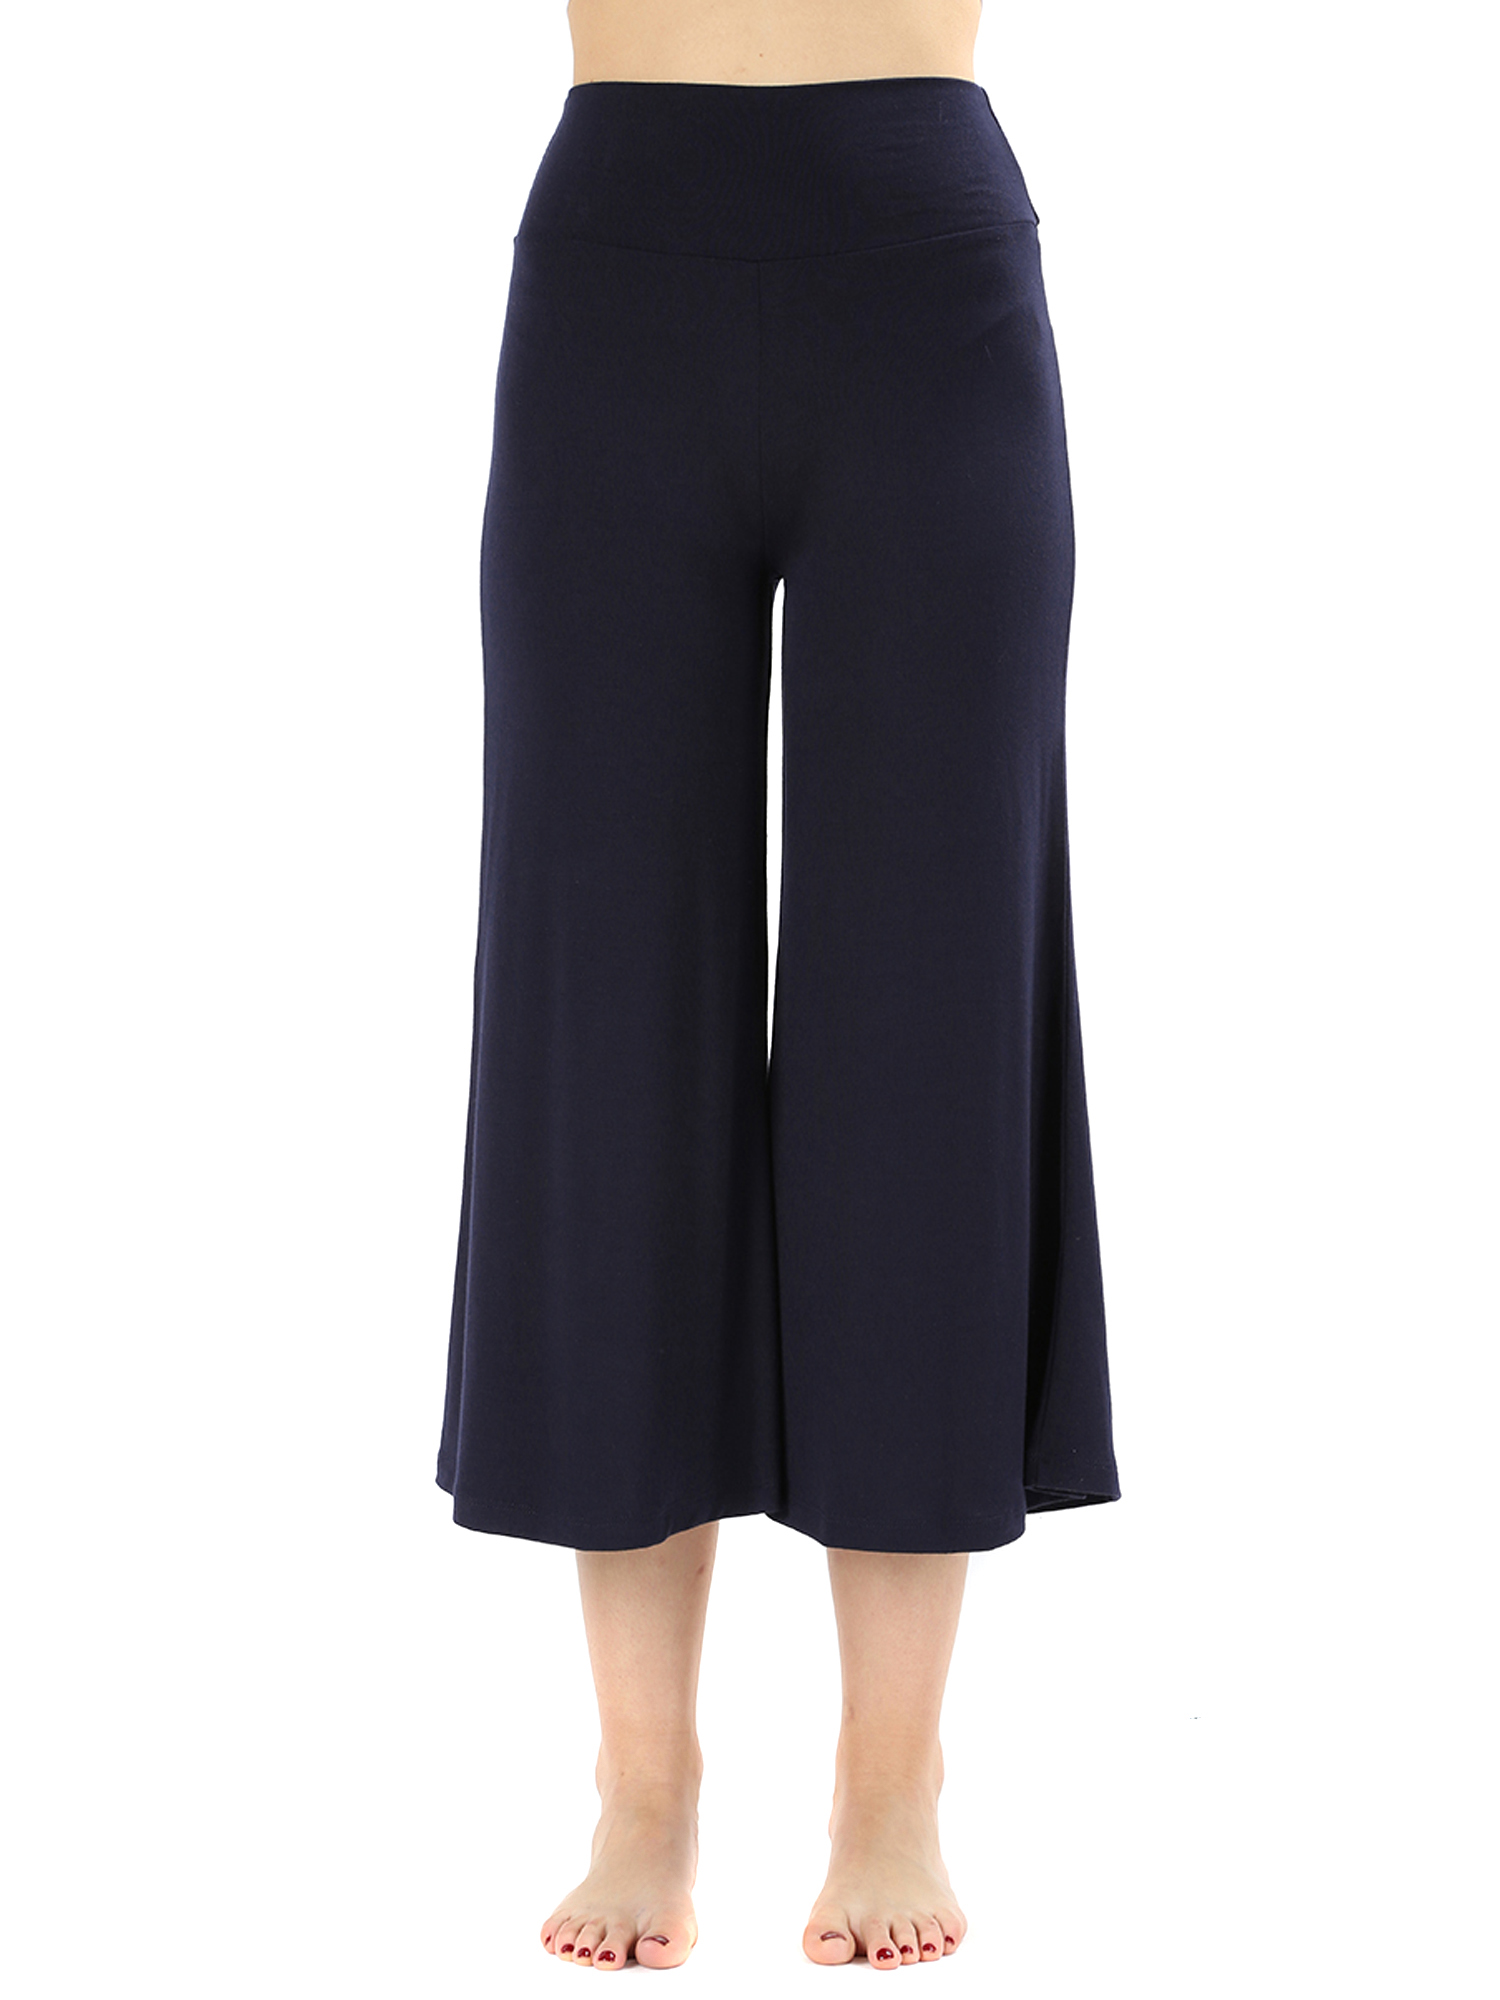 Womens Knit Capri Culottes Gaucho Wide Leg Pants